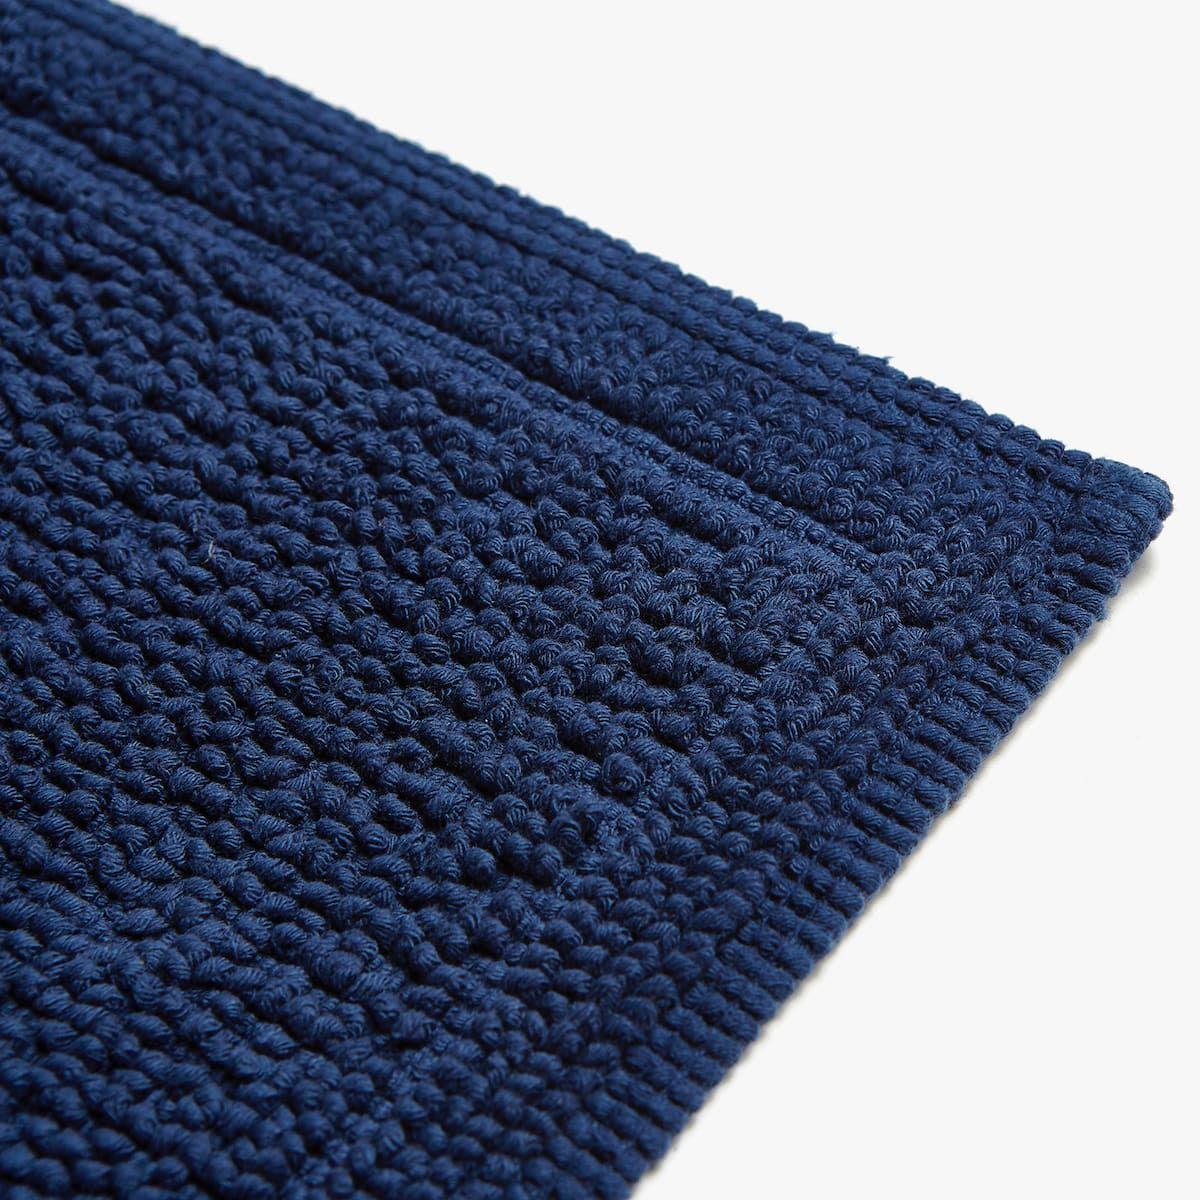 Reversible Bleu Tapis De Bain Bleu 50 X 70 Cm Zara Home